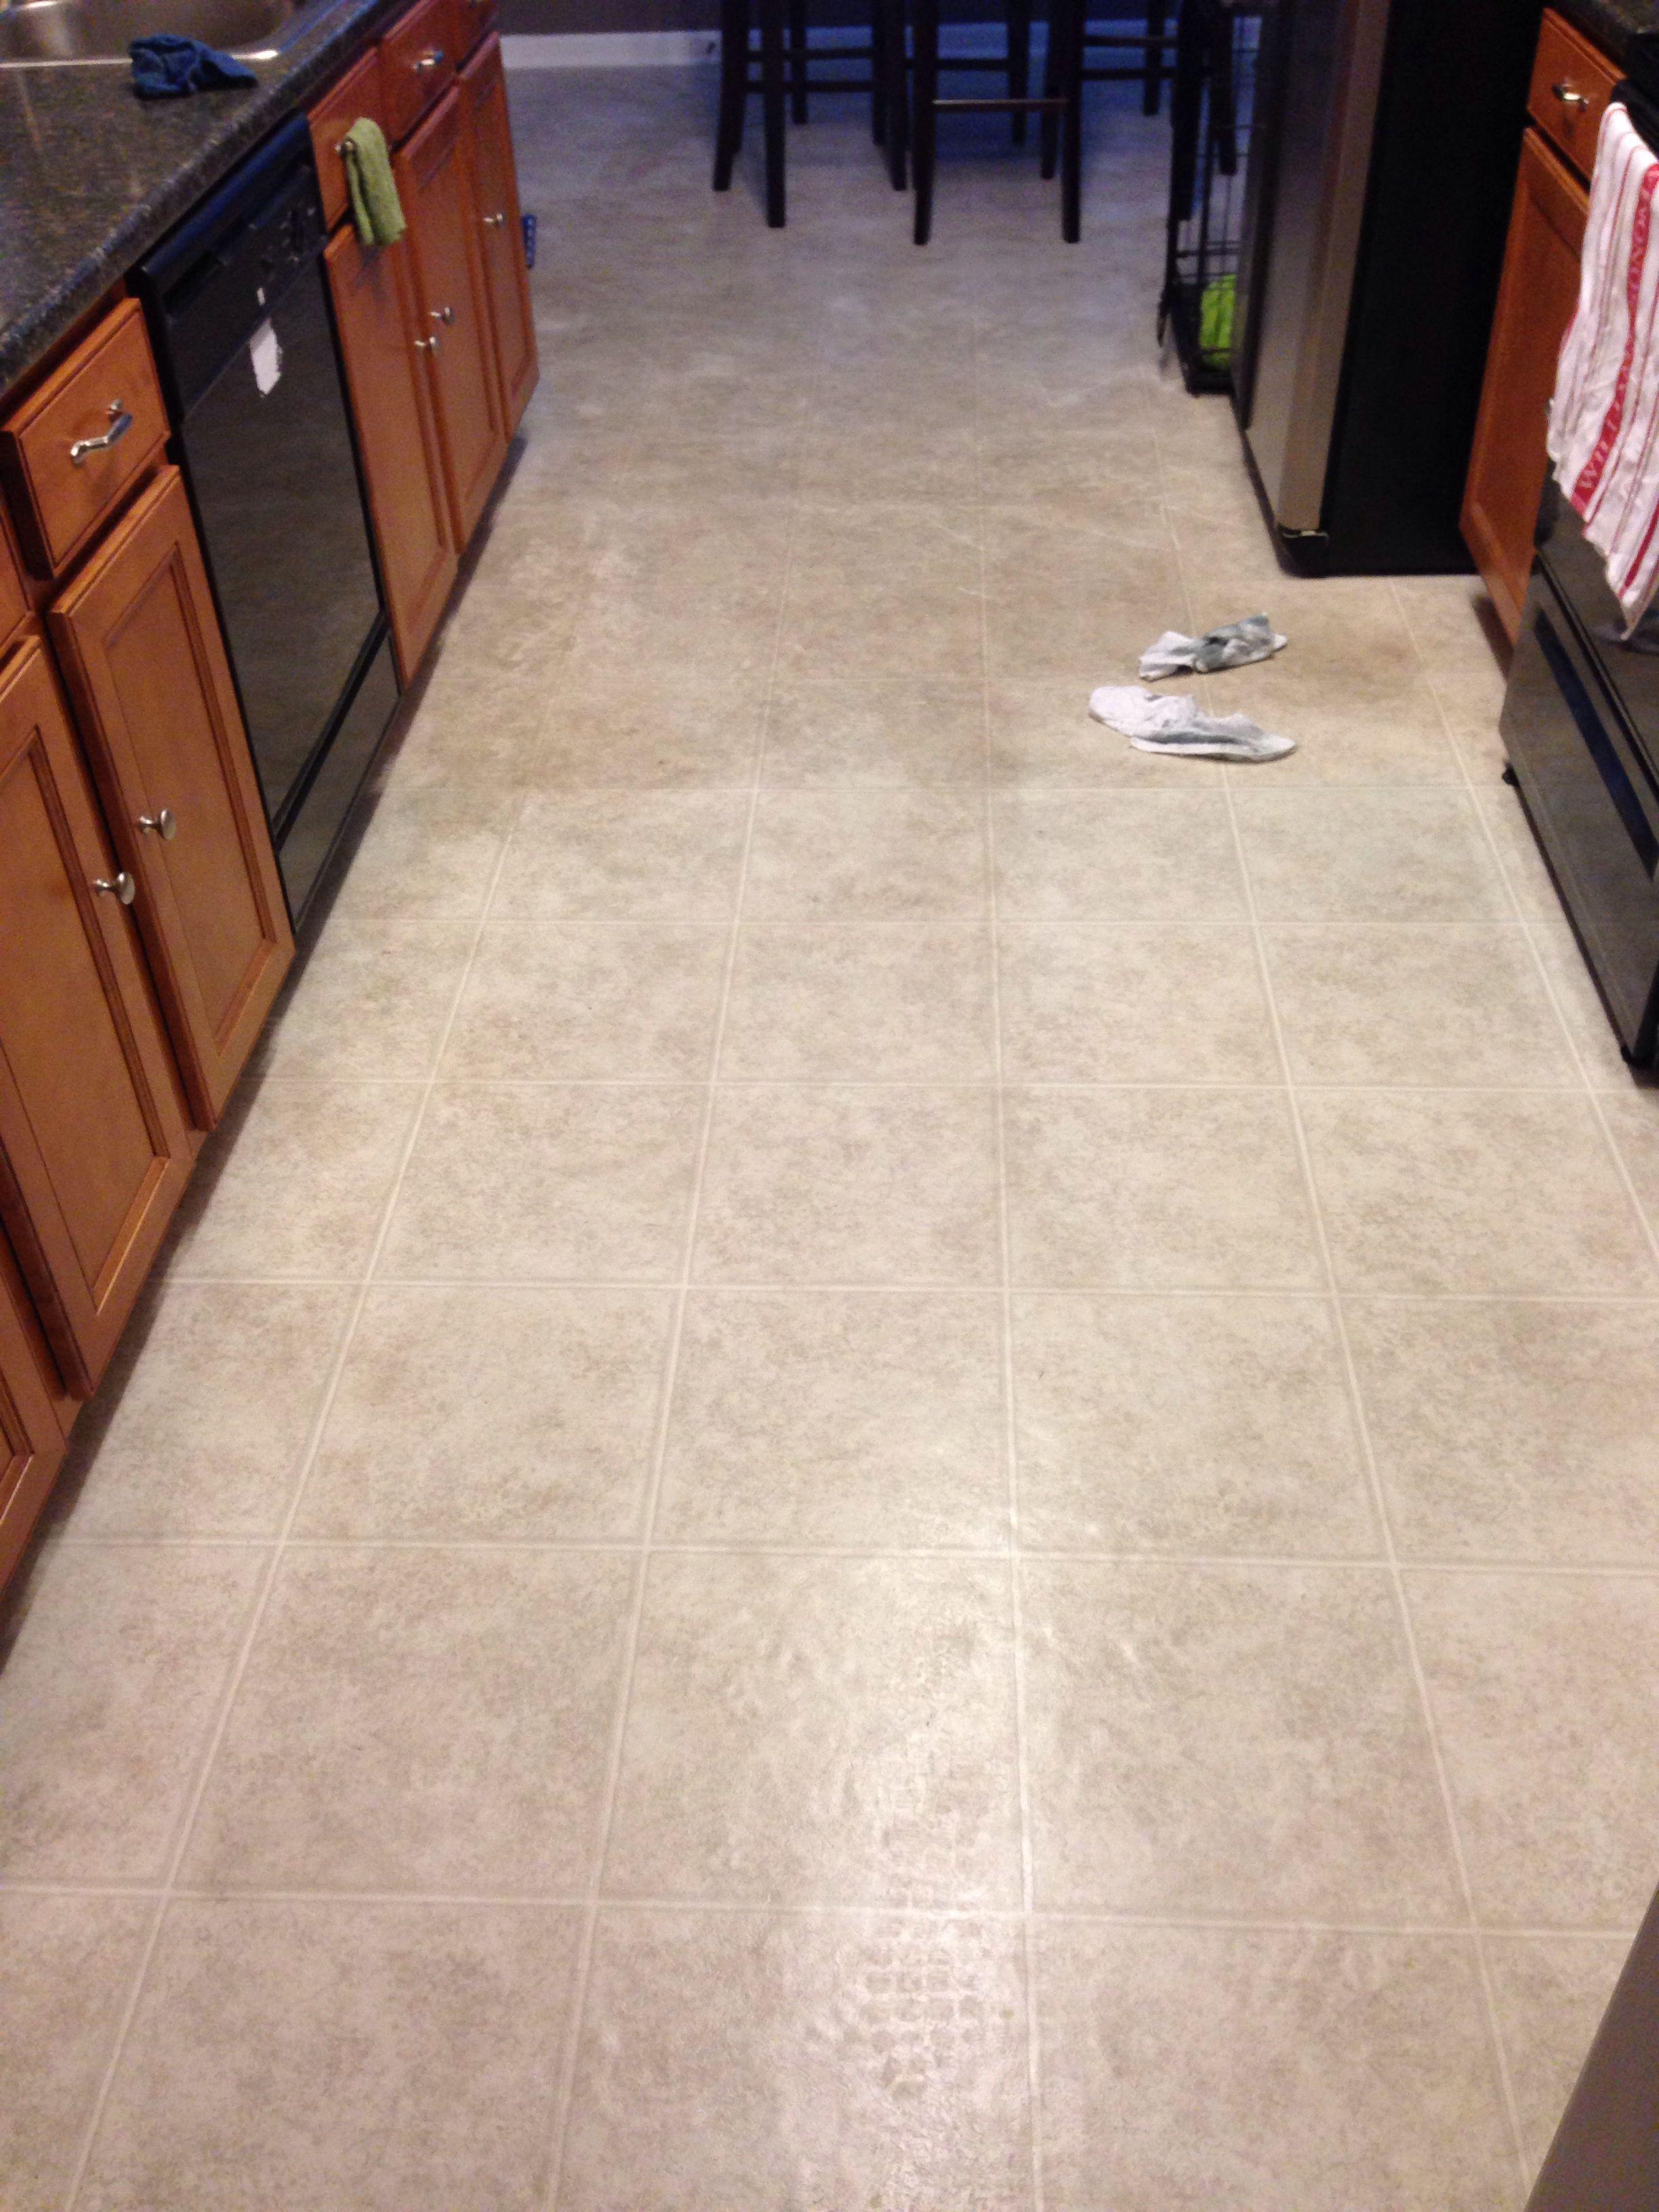 Use an sos pad to clean vinyl floors diy ideas pinterest clean use an sos pad to clean vinyl floors dailygadgetfo Choice Image